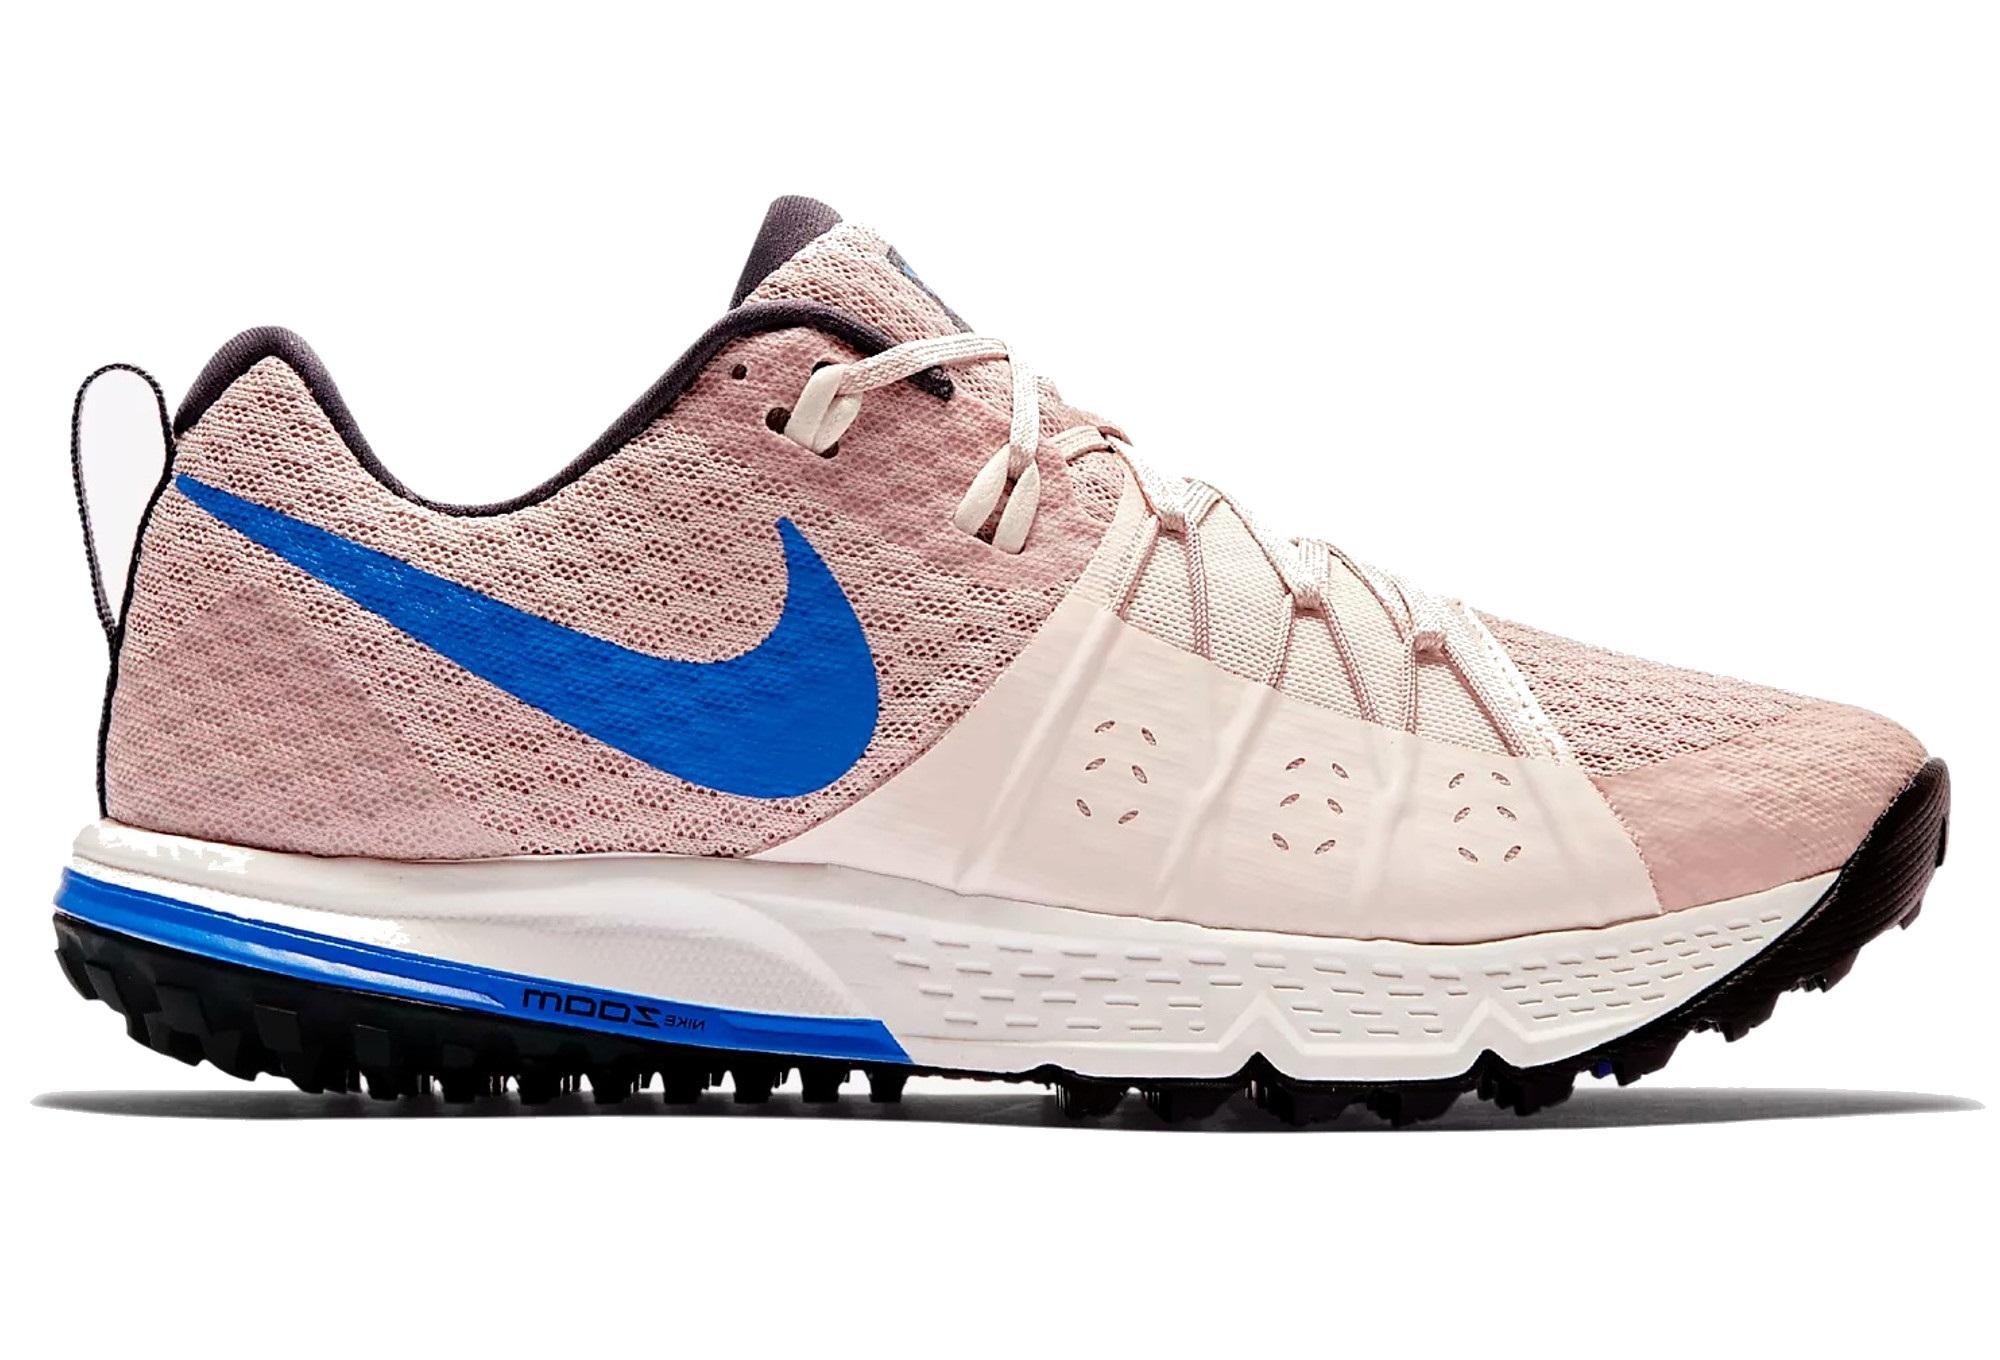 Nike Schuhe Air Zoom Wildhorse 4 Beige Blau Frauen